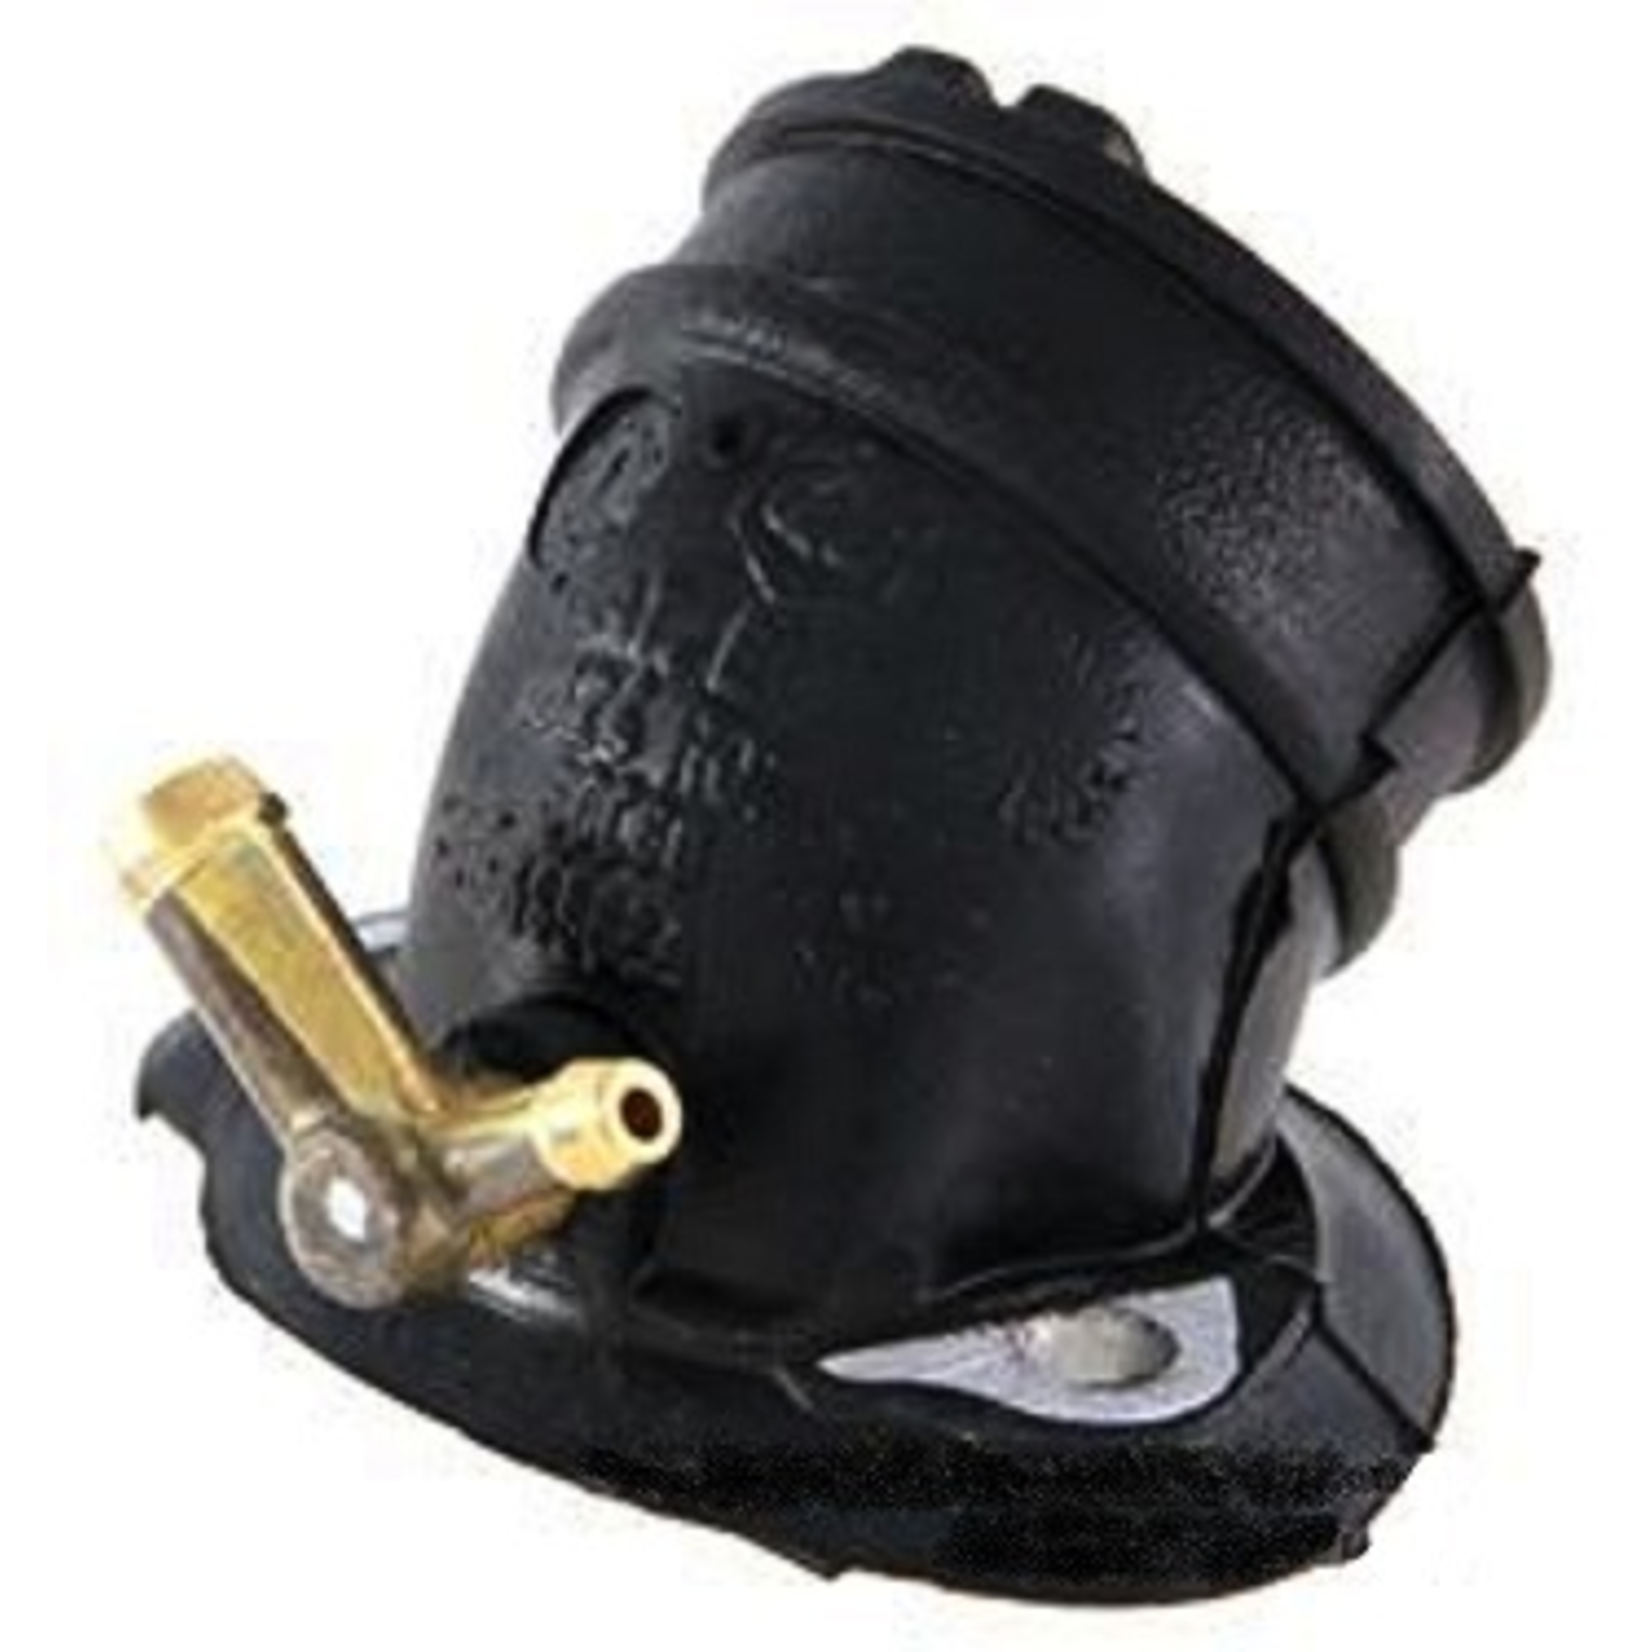 Parts Intake manifold, LX150/Fly150 Carburetor